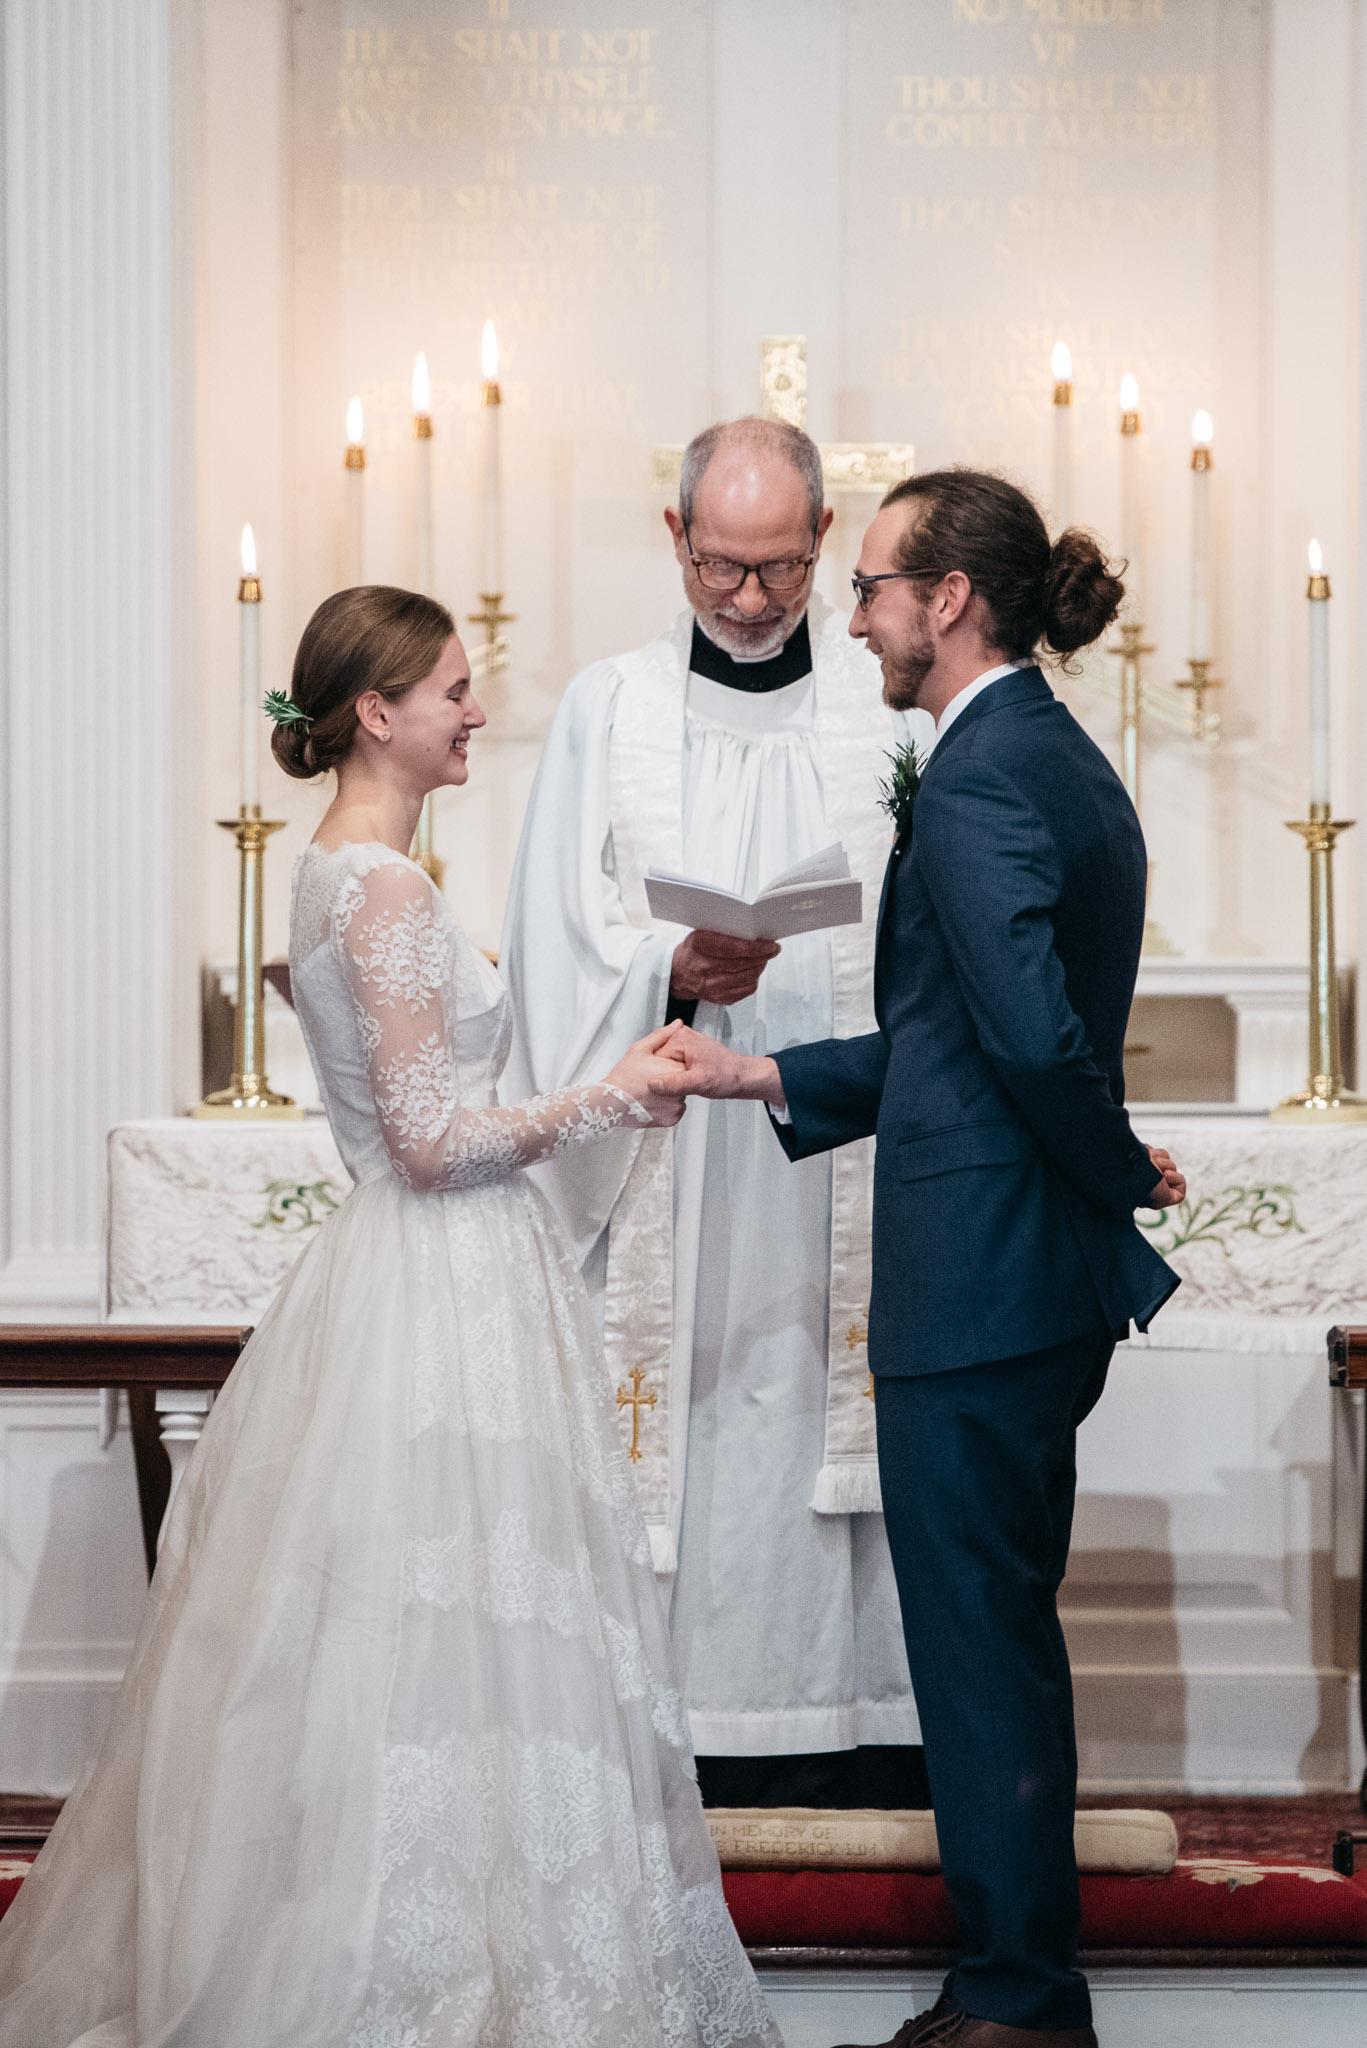 St Michaels Church wedding ceremony, Ligonier Wedding Photographer-0968.jpg